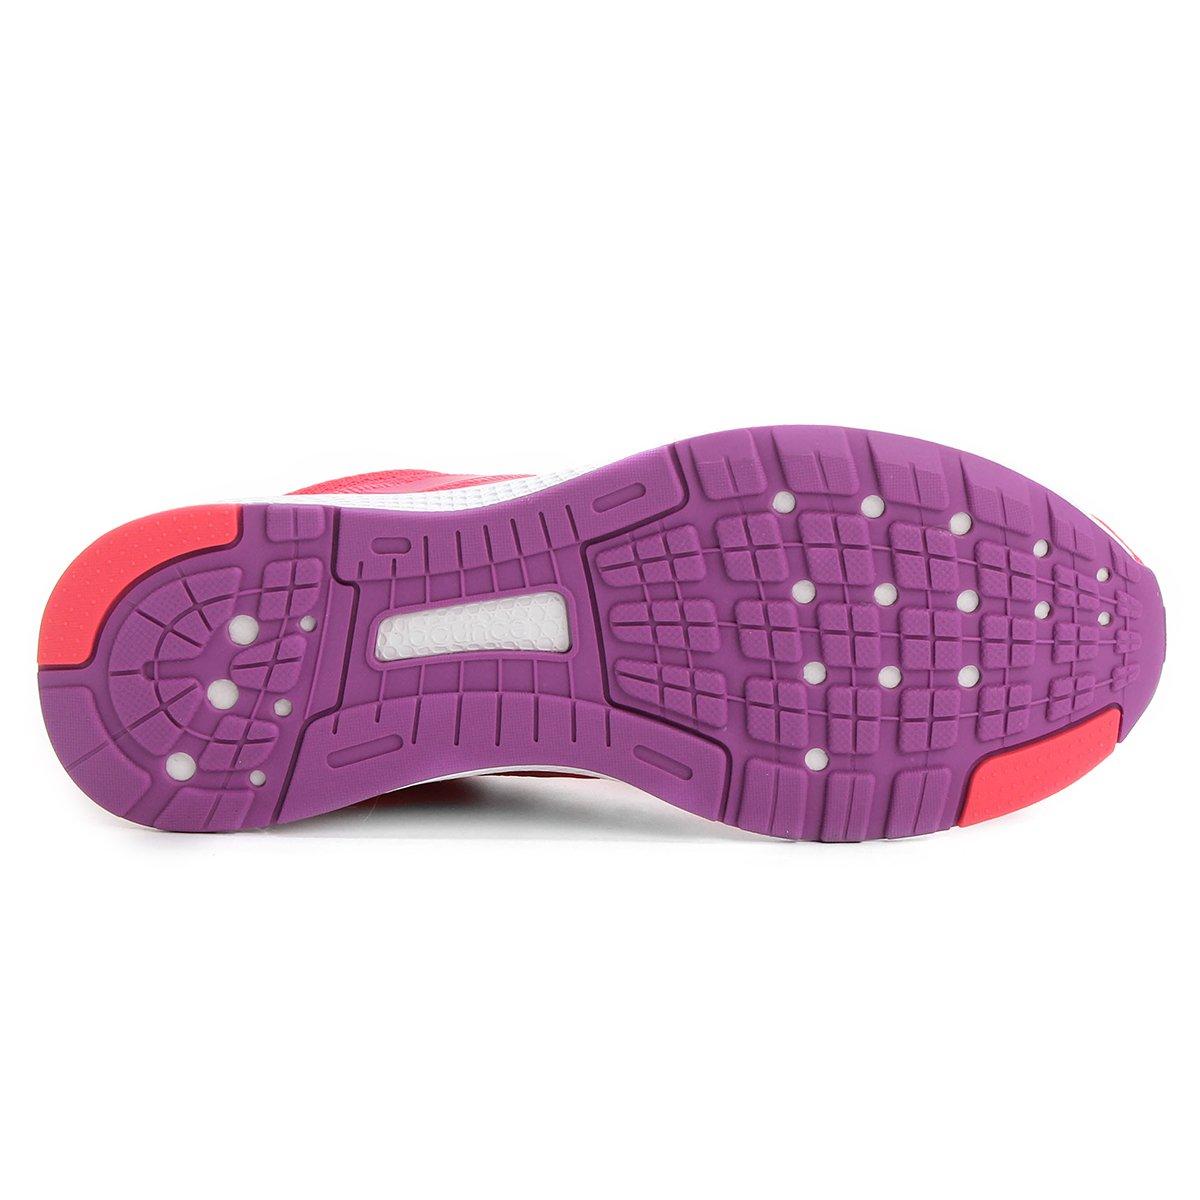 Tênis Feminino Adidas Tênis Adidas Mana Bounce Mana Branco e Bounce Rosa Feminino rnHqfTxwBr